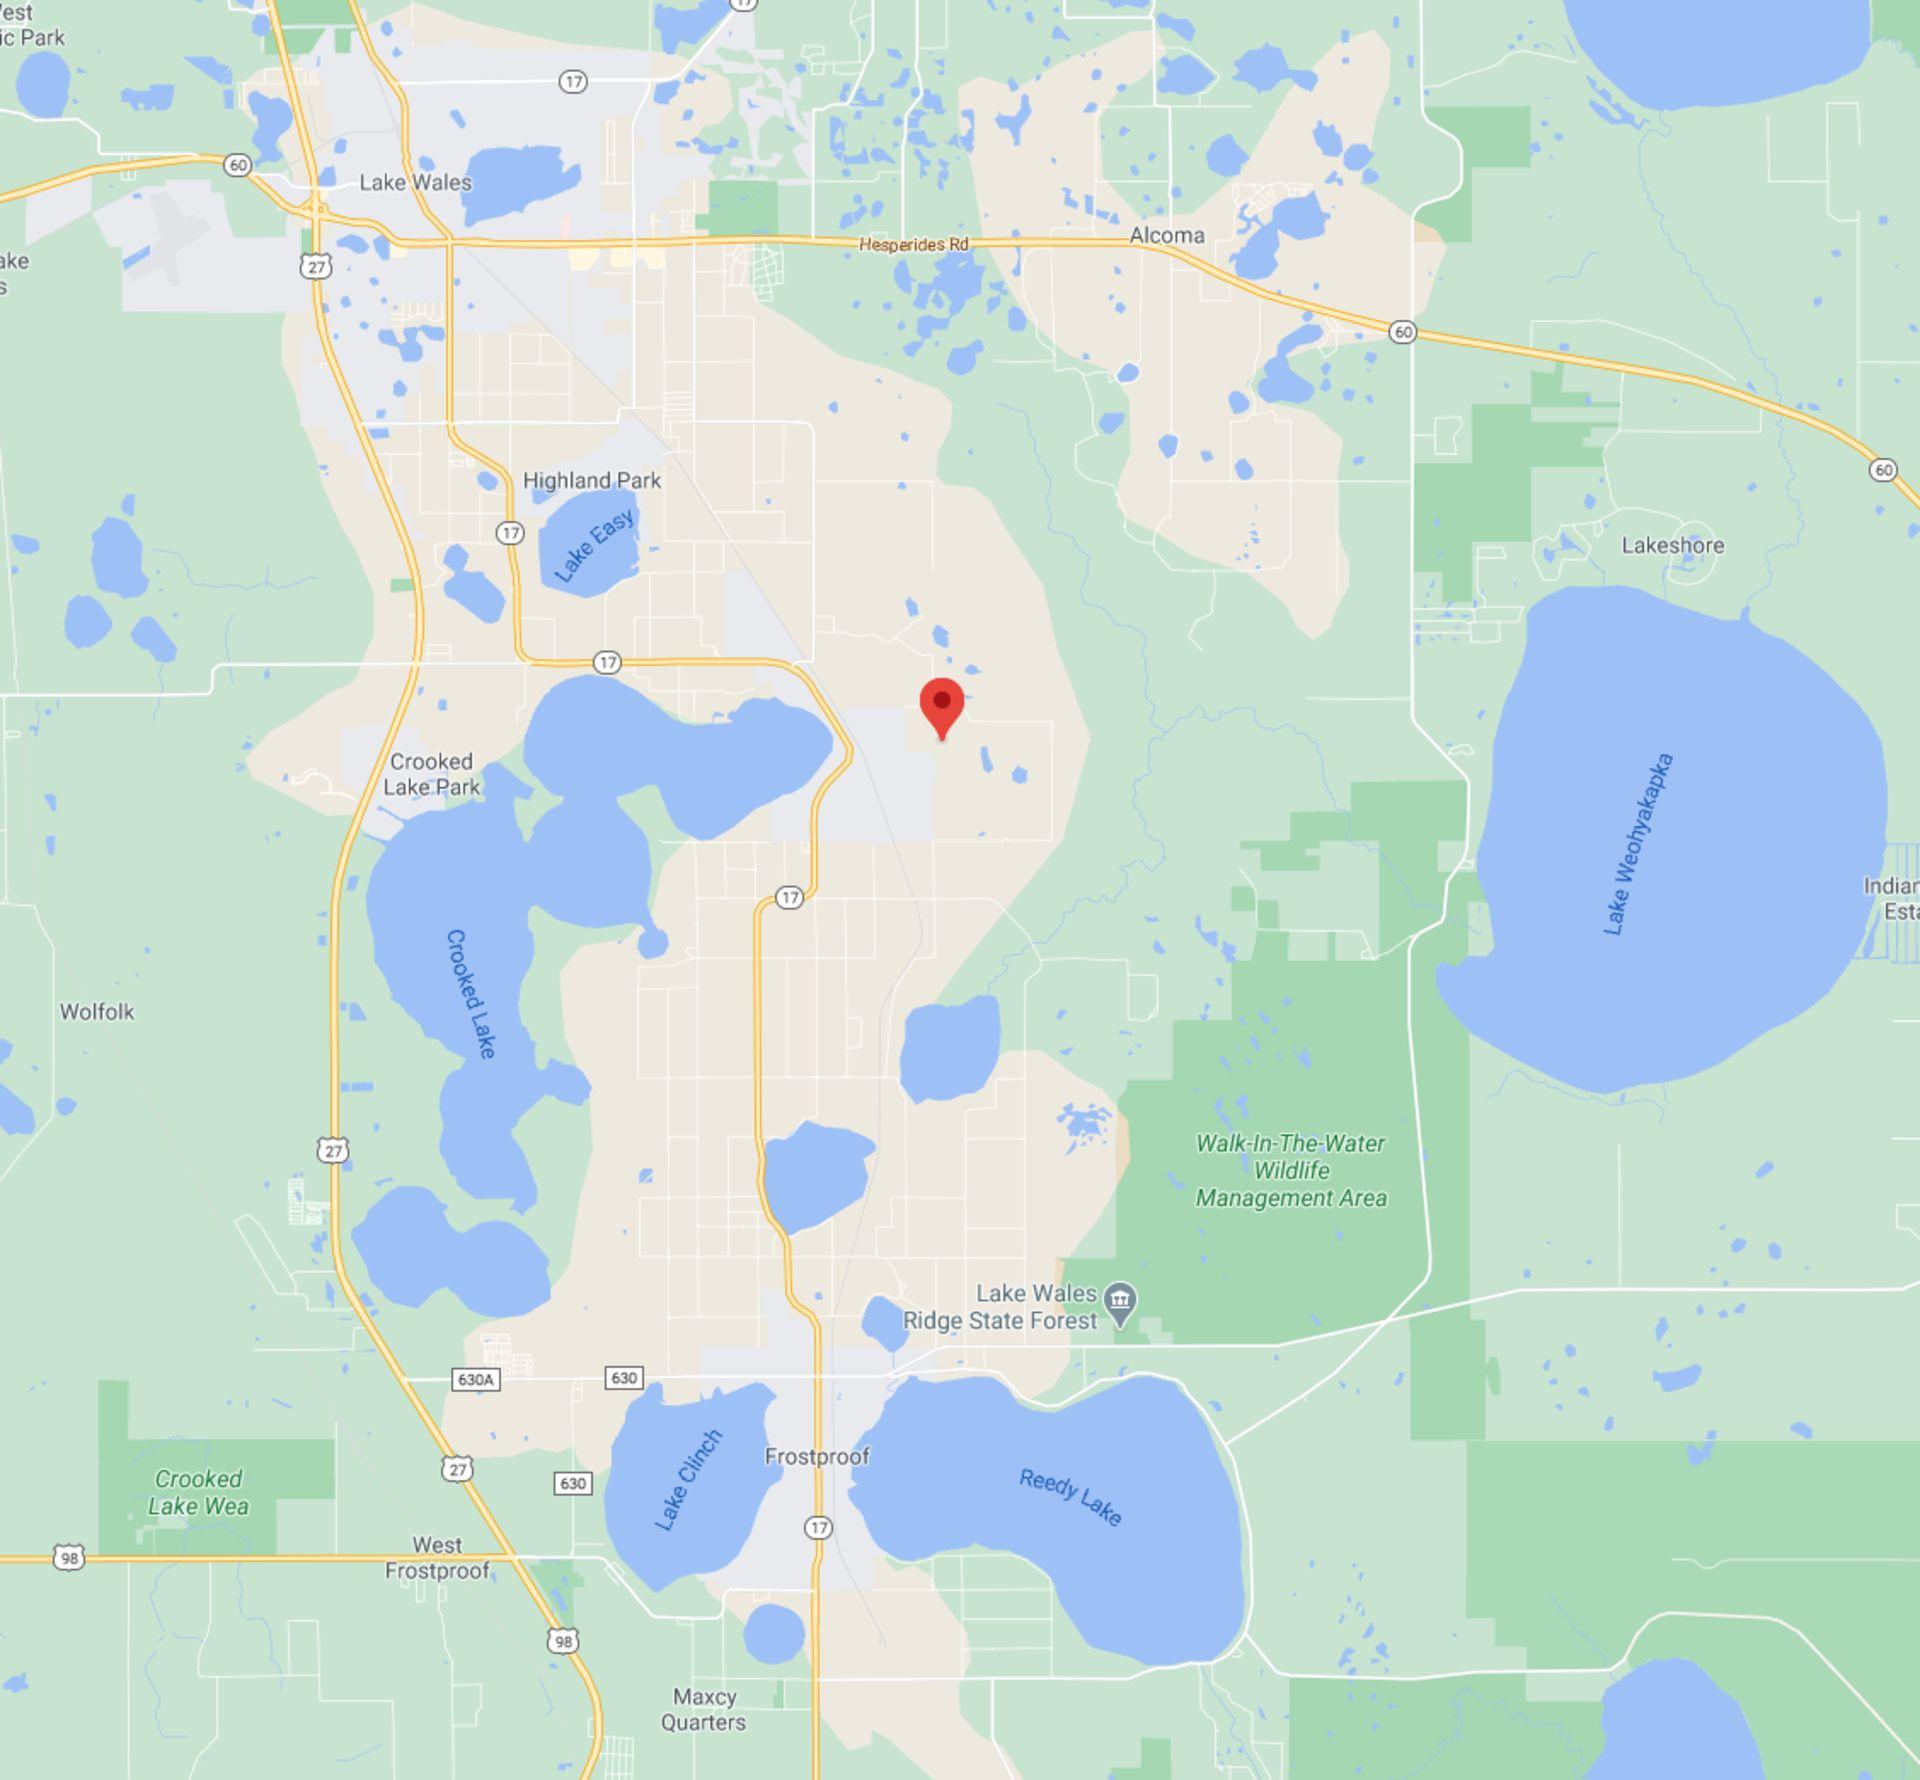 Peaceful Polk County, Florida! - Image 6 of 6